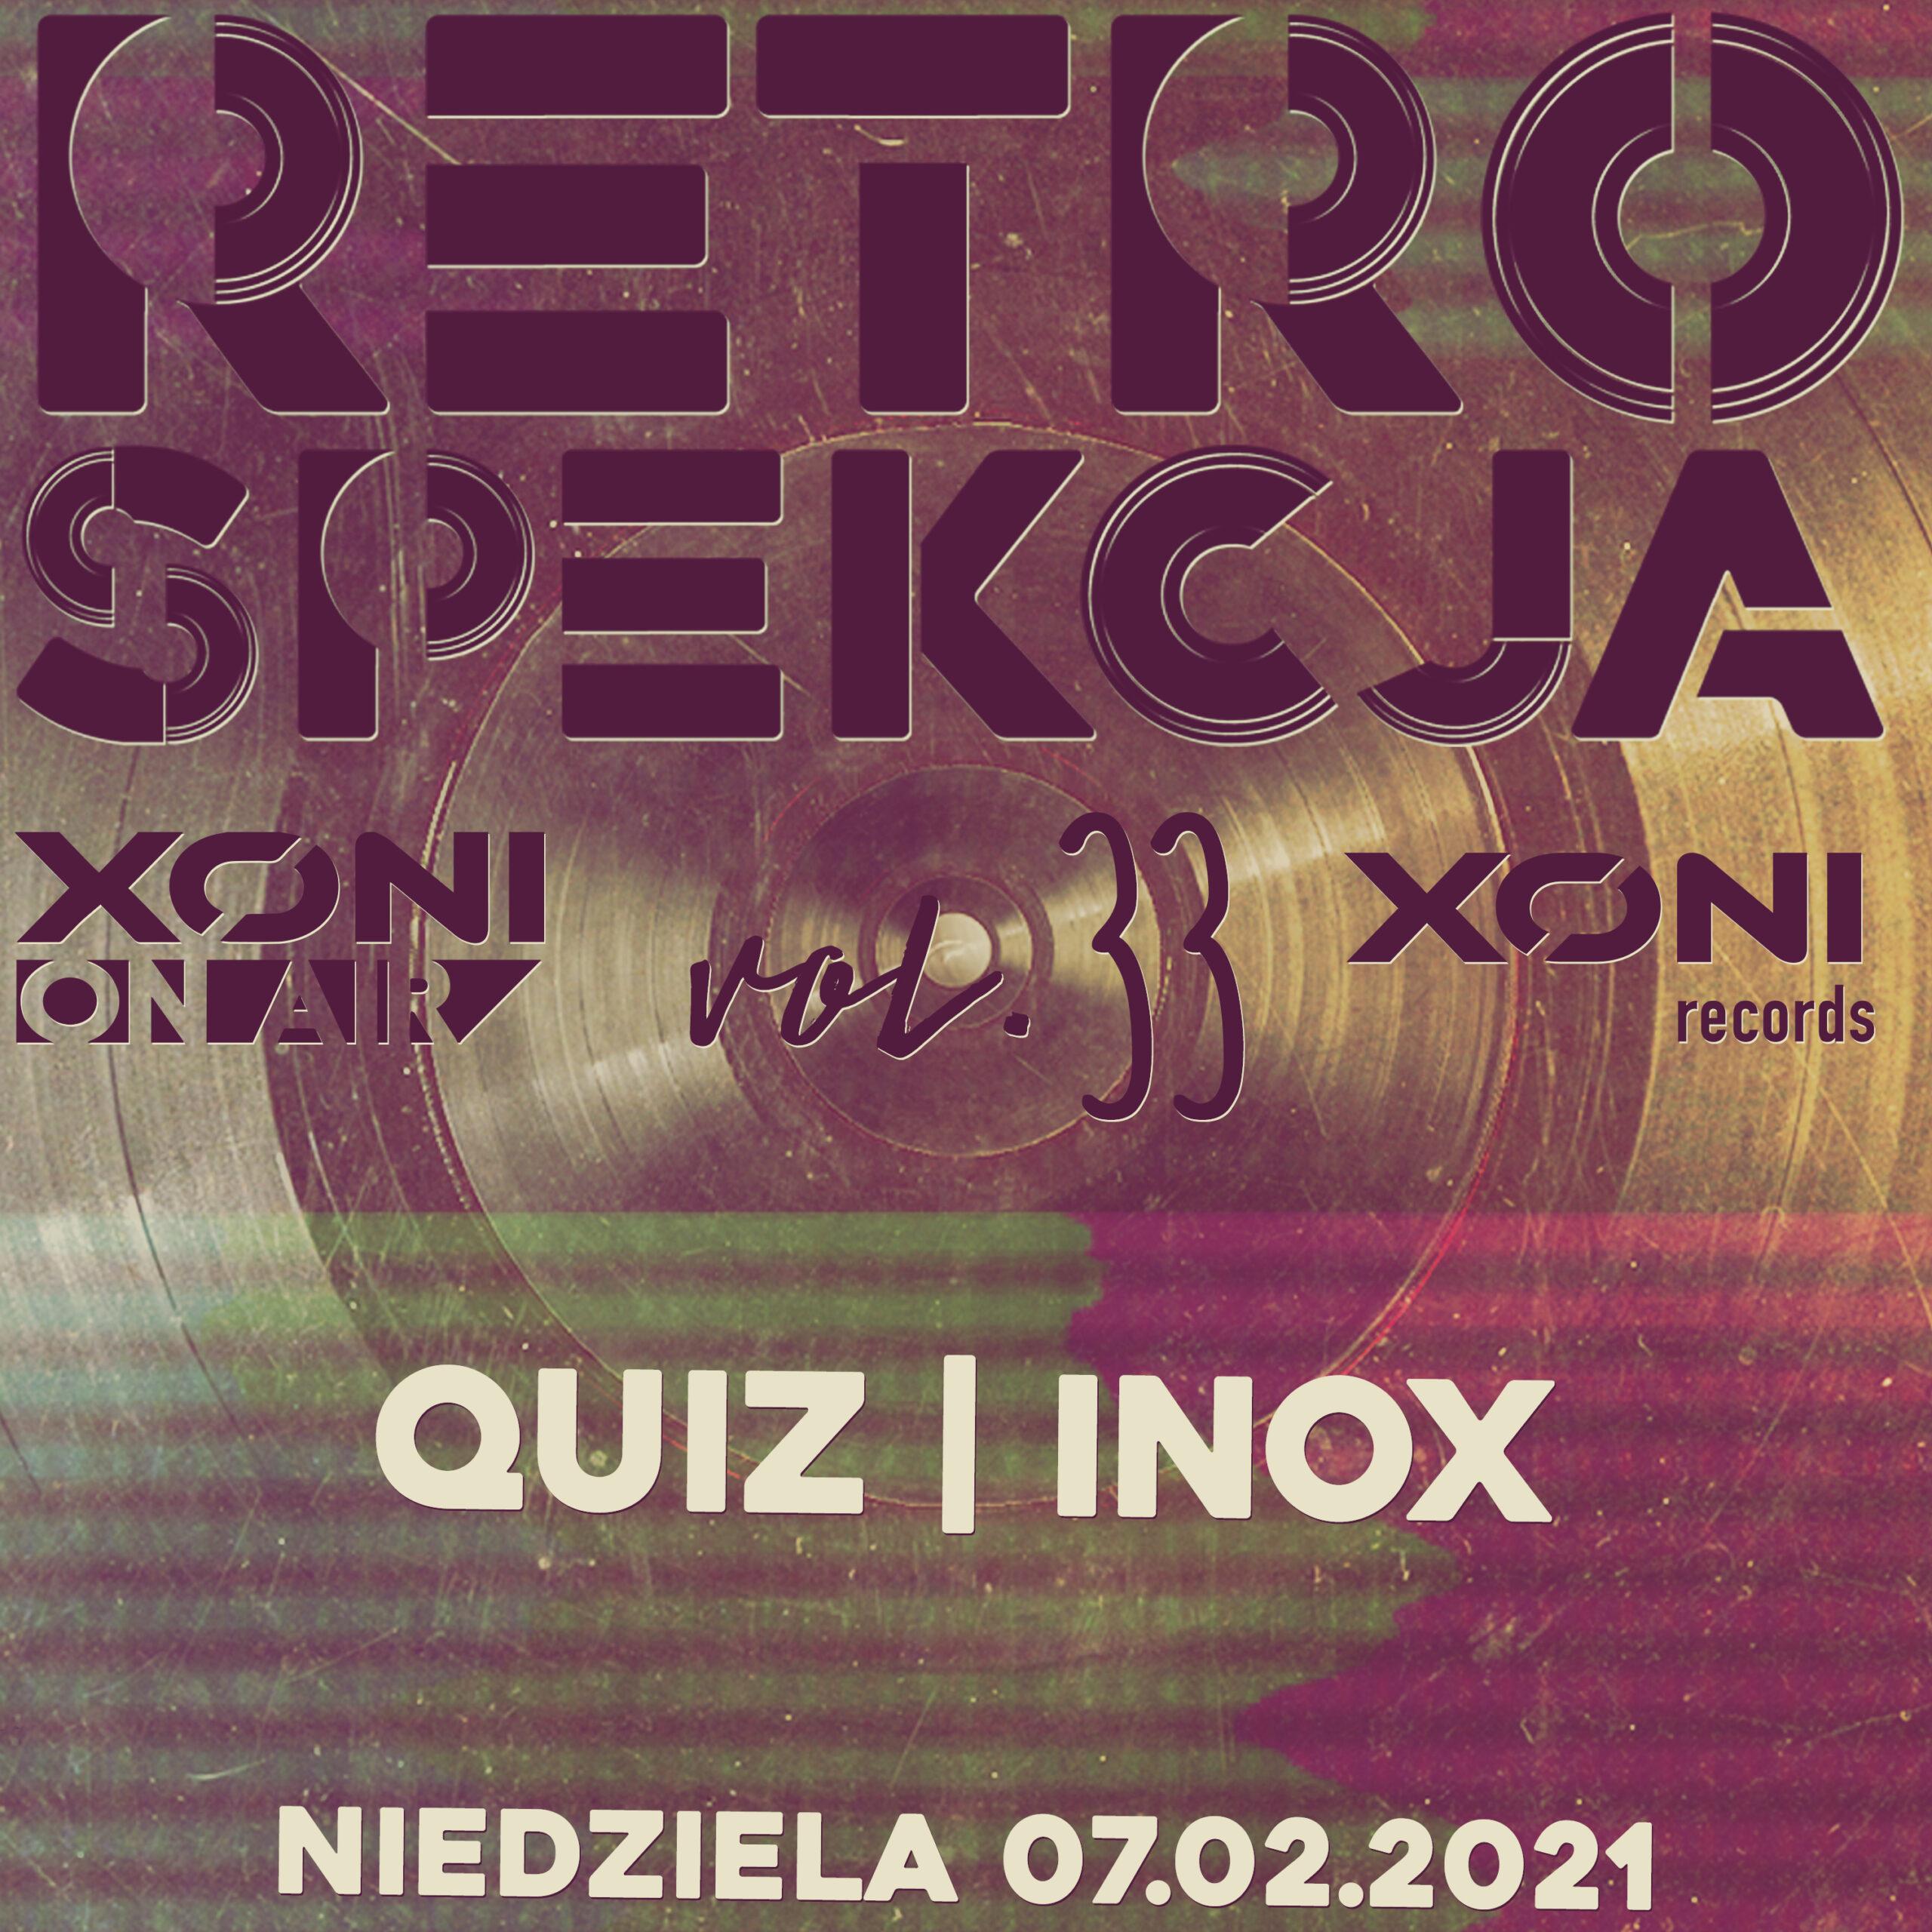 Retrospekcja Vol.33 Quiz/Inox